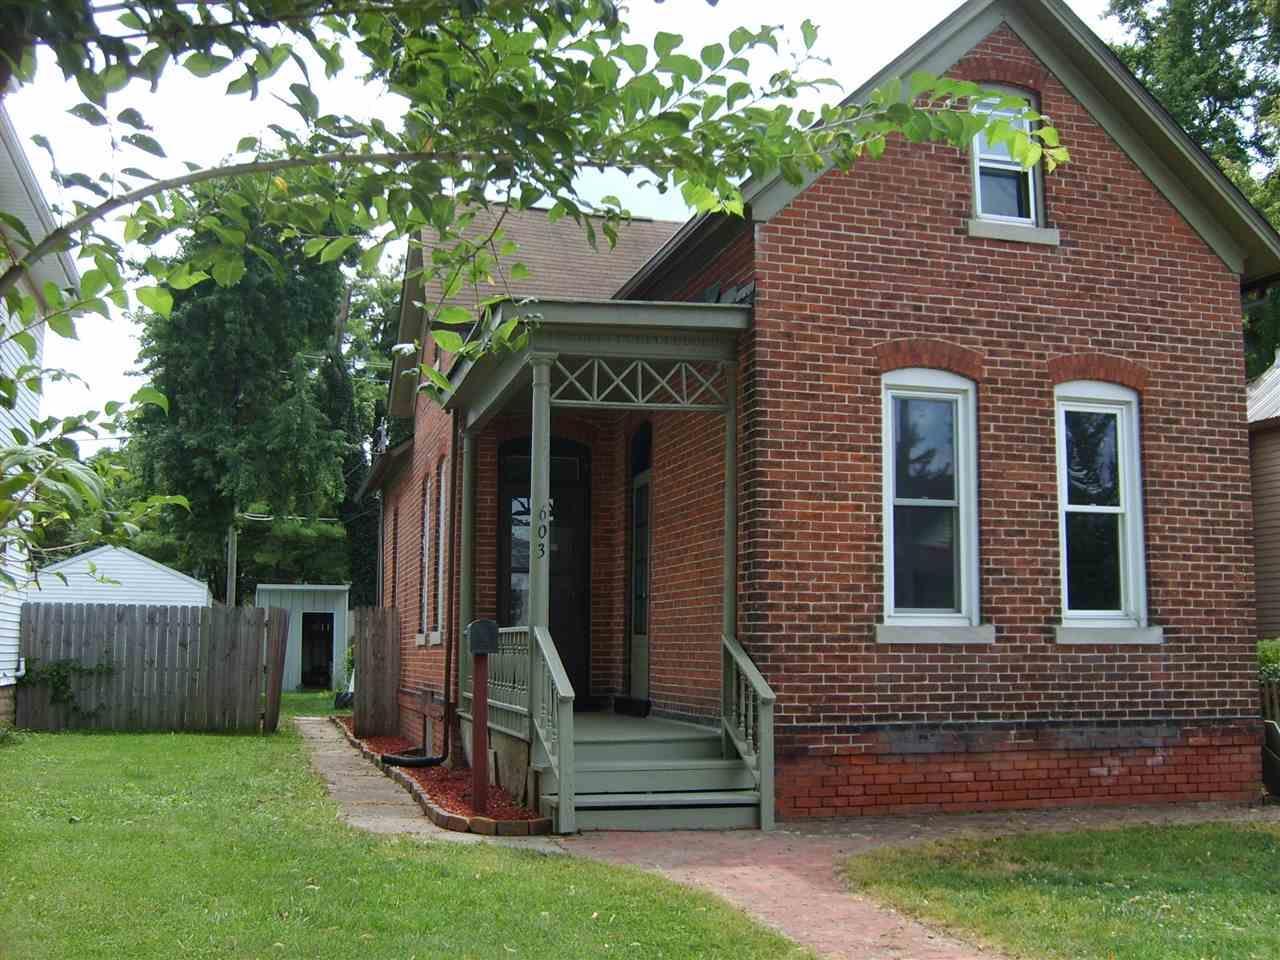 603 Kinsmoor, Fort Wayne, IN 46807